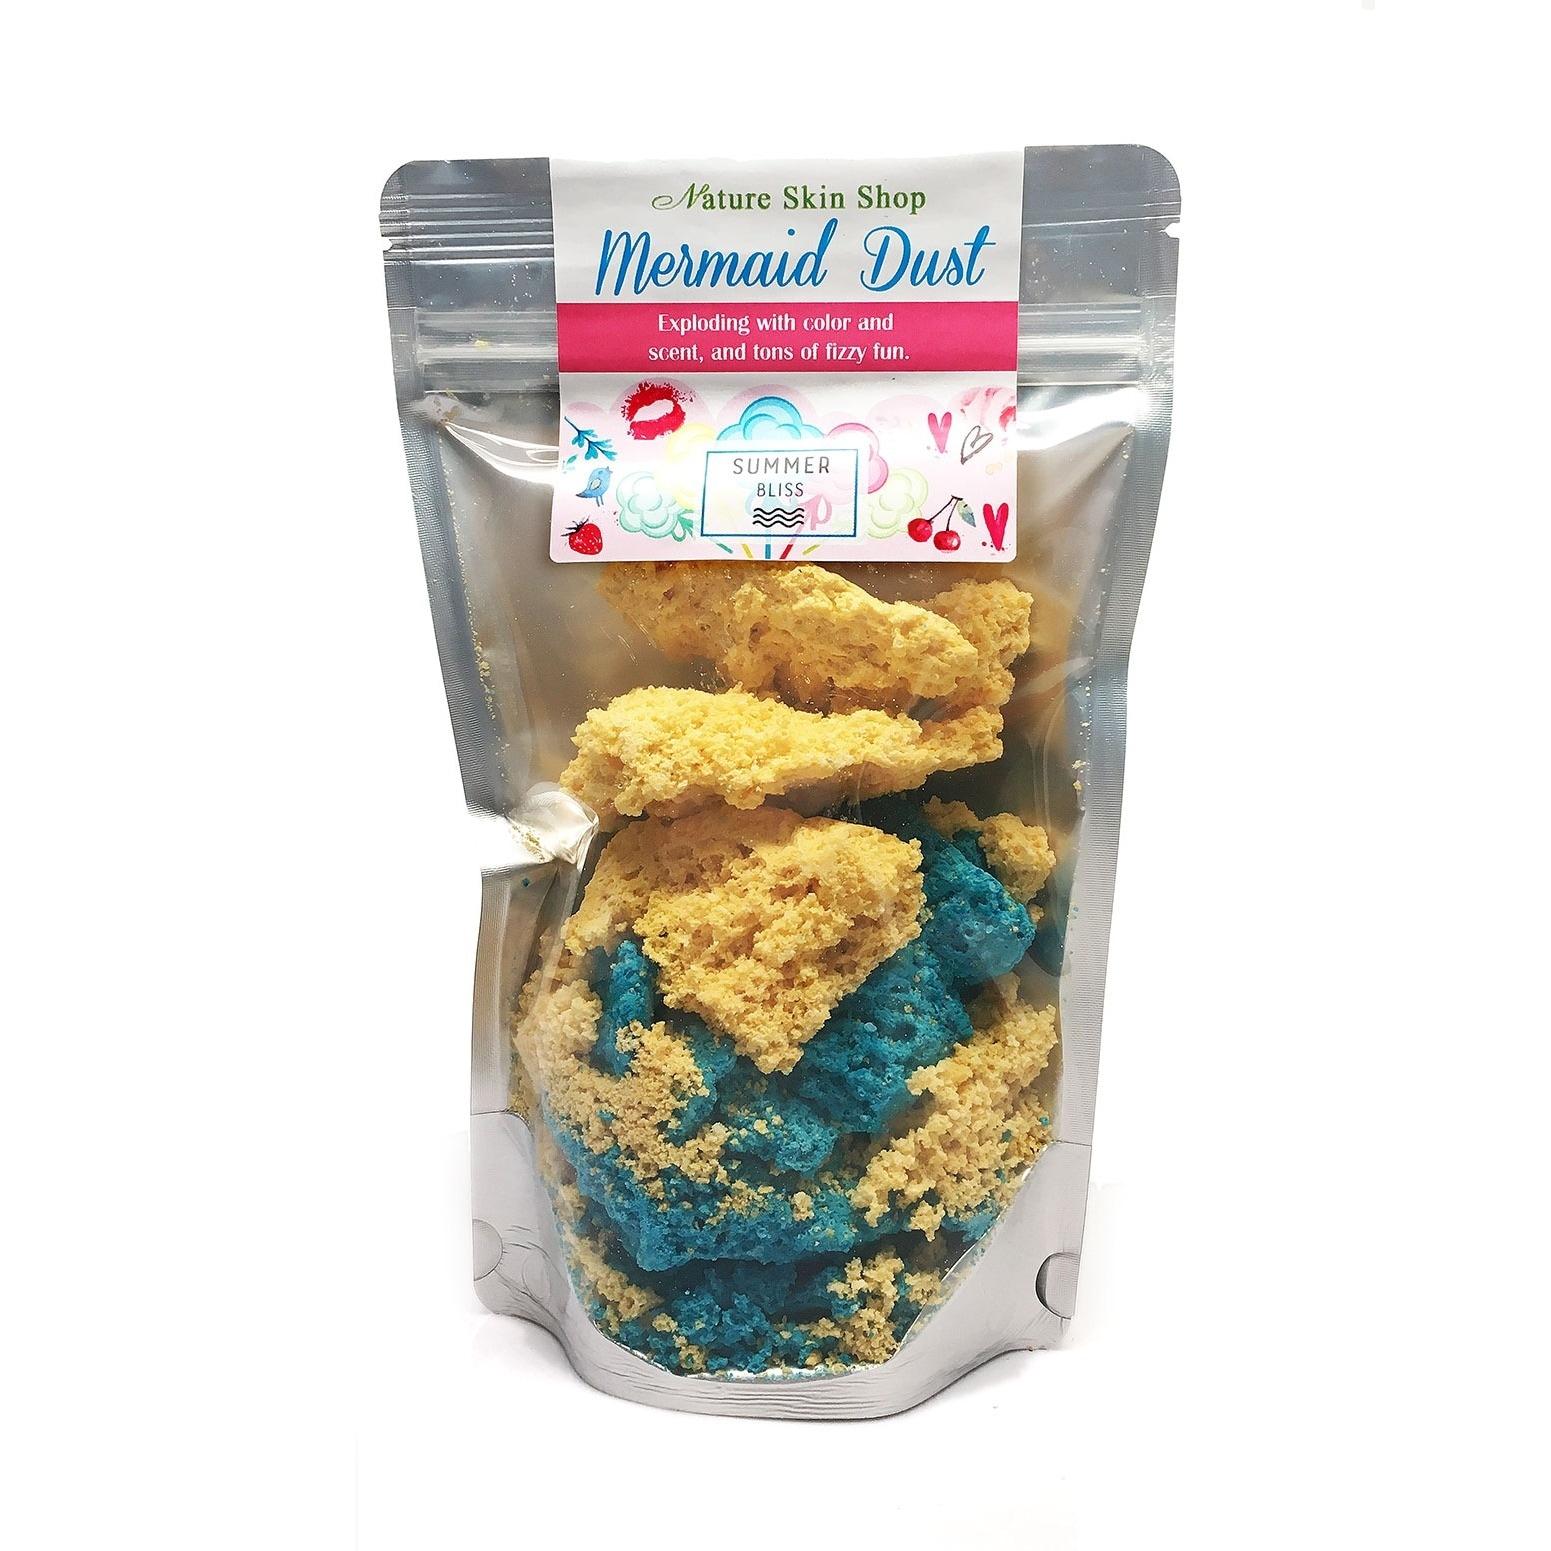 Nature Skin Shop Mermaid Dust Bath Bomb Fizzie Powder (Ye...